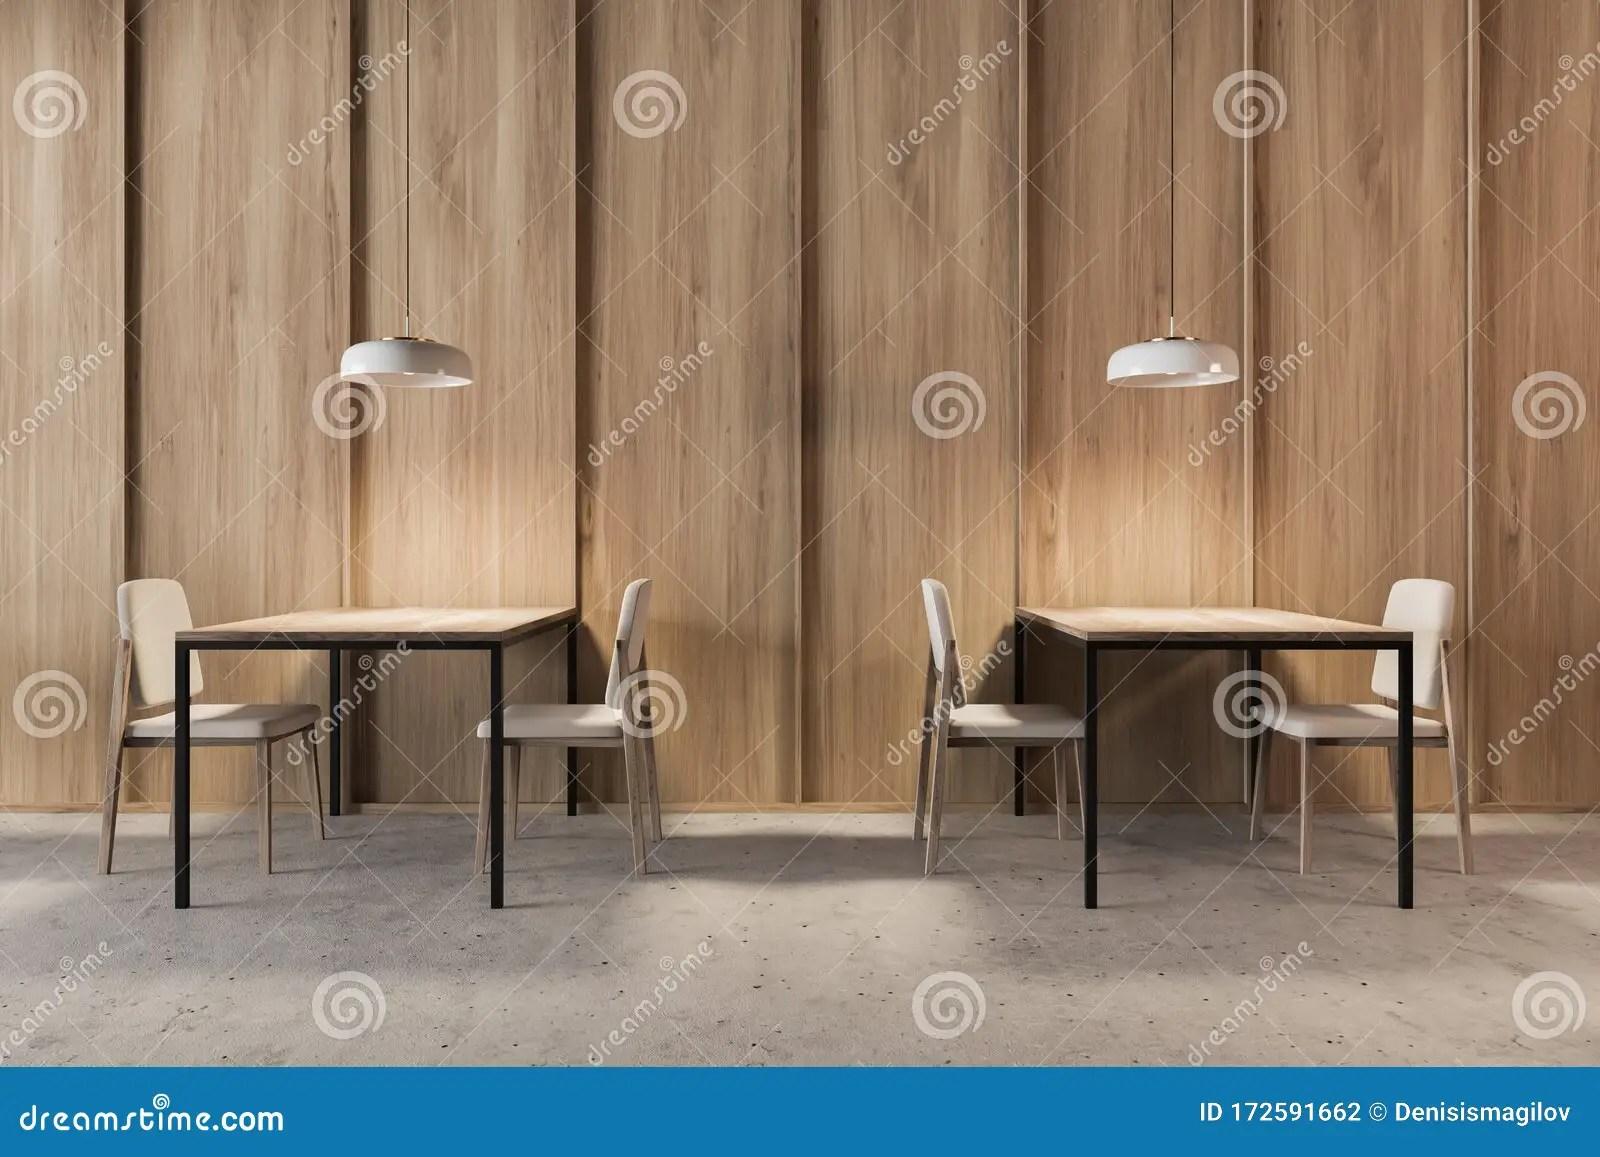 Dark Wooden Industrial Style Cafe Interior Stock Illustration Illustration Of Decoration Ceiling 172591662